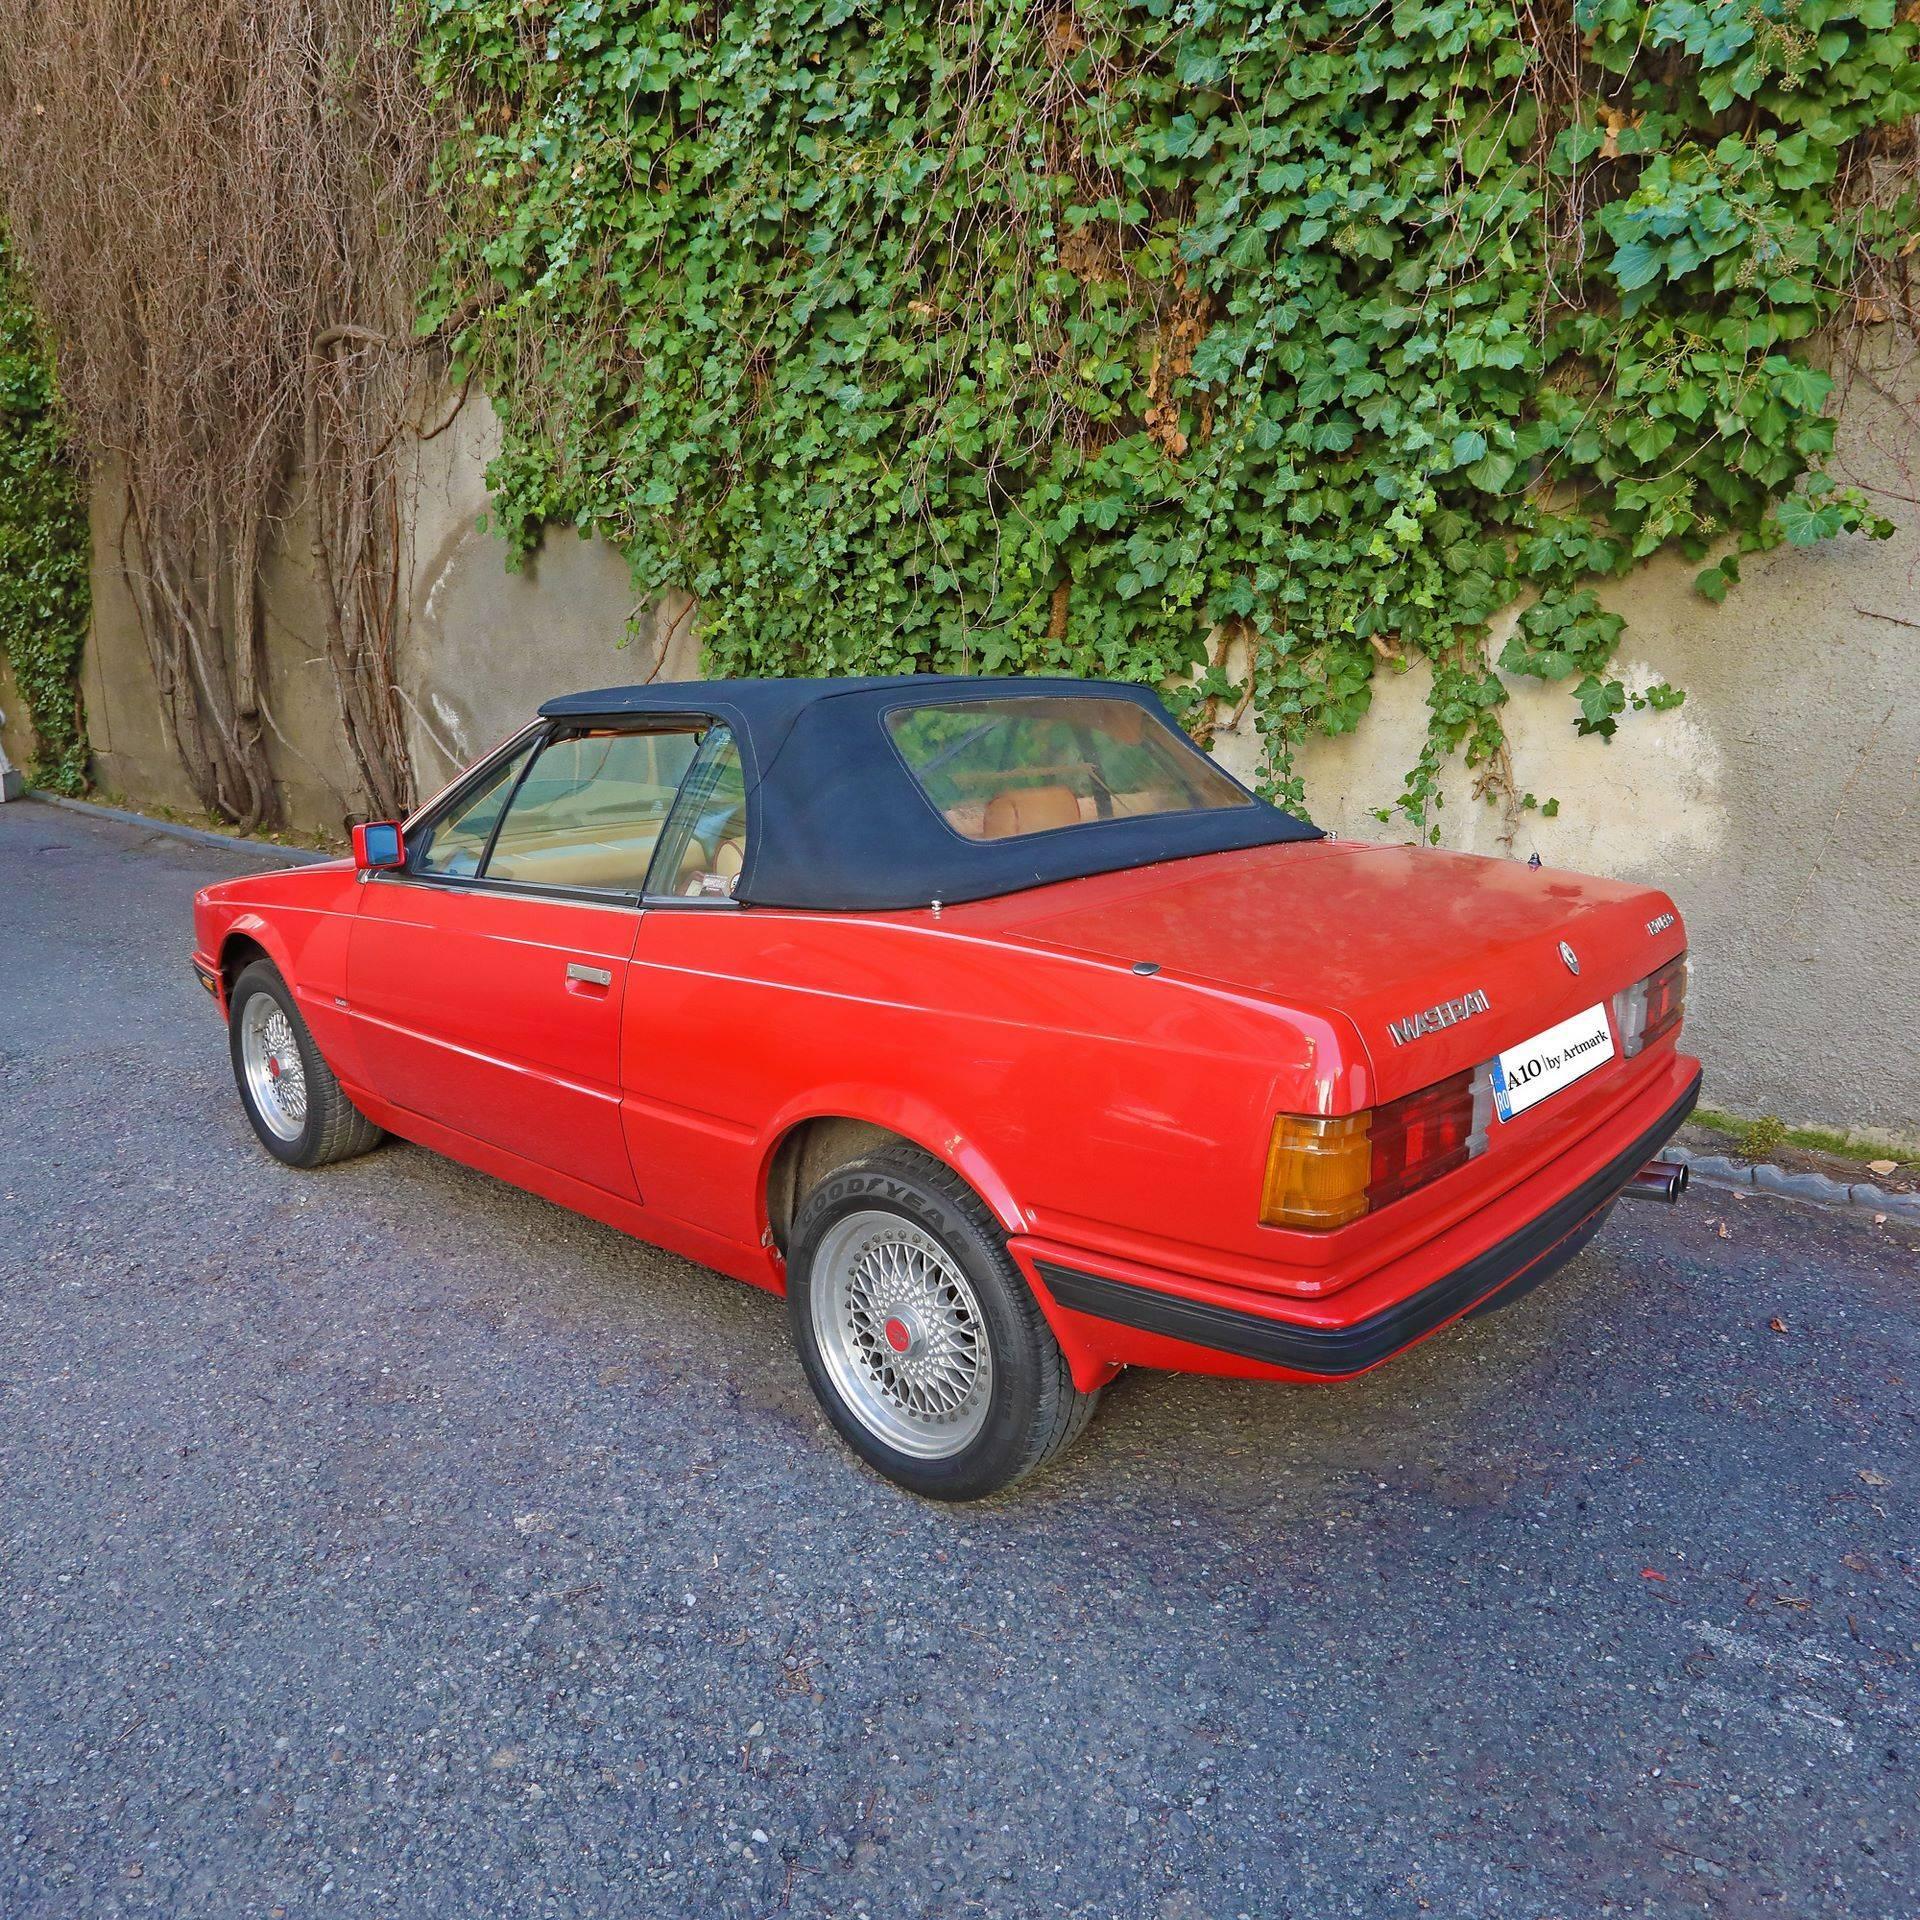 Maserati-Biturbo-Spyder-Elton-John-2